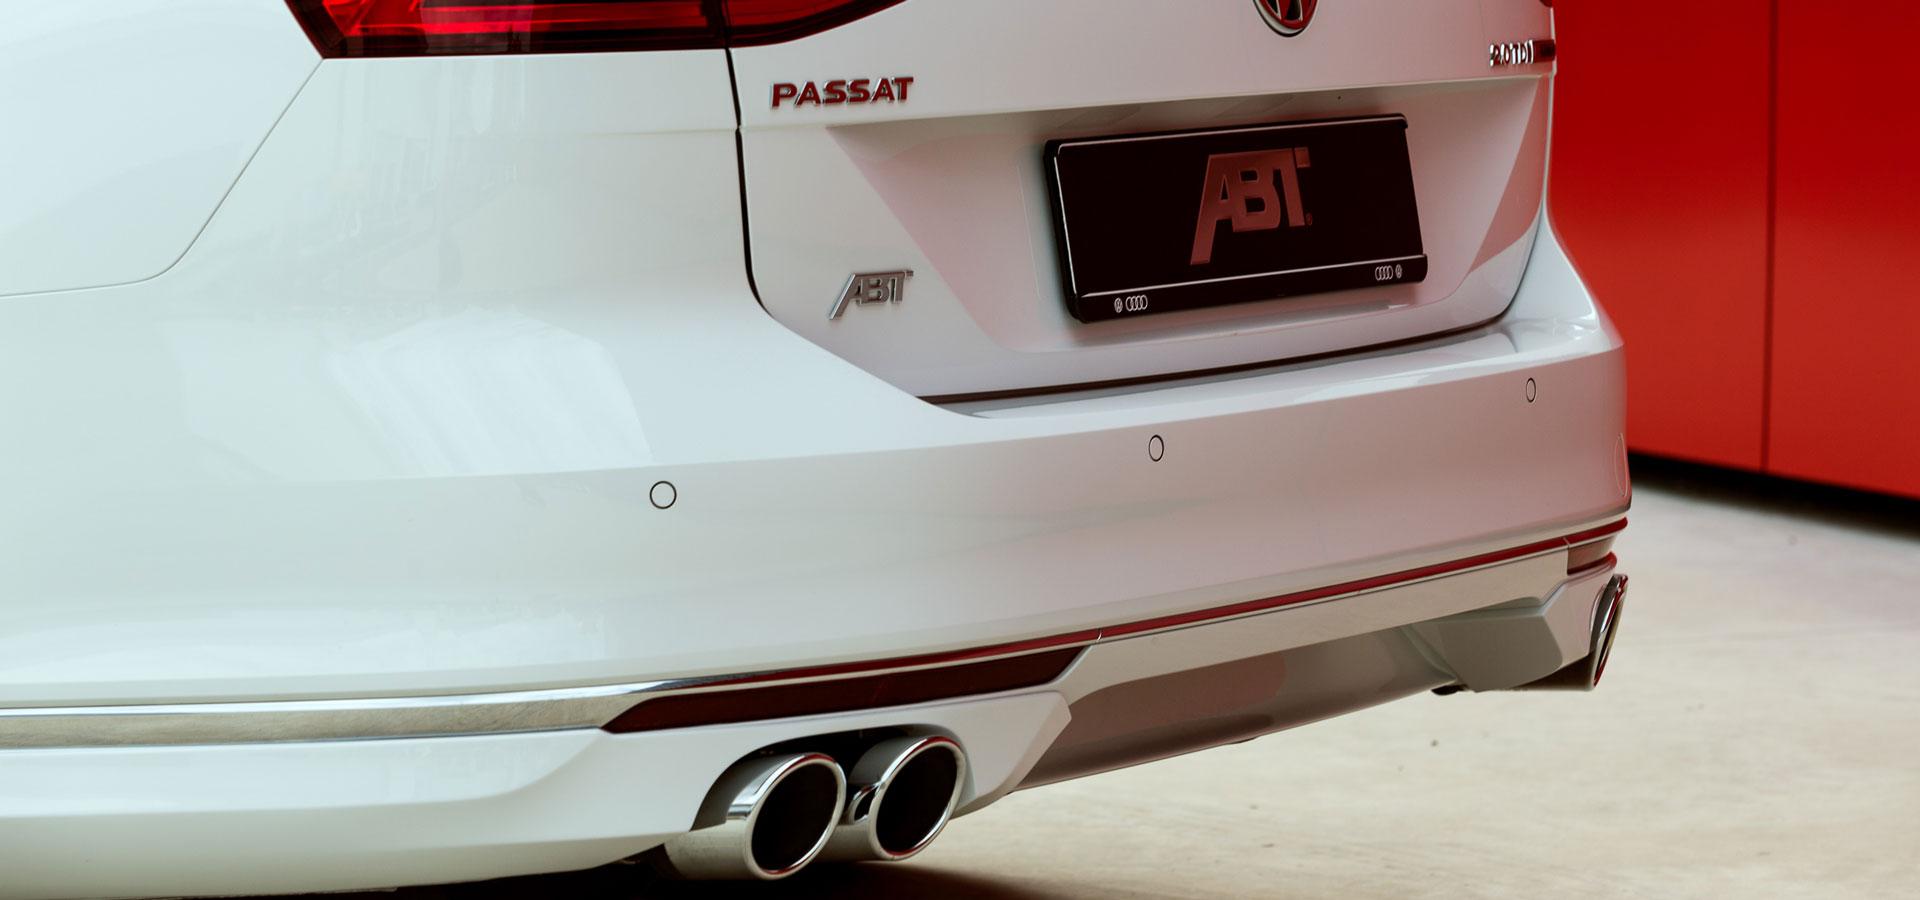 Vw Passat Abt Sportsline